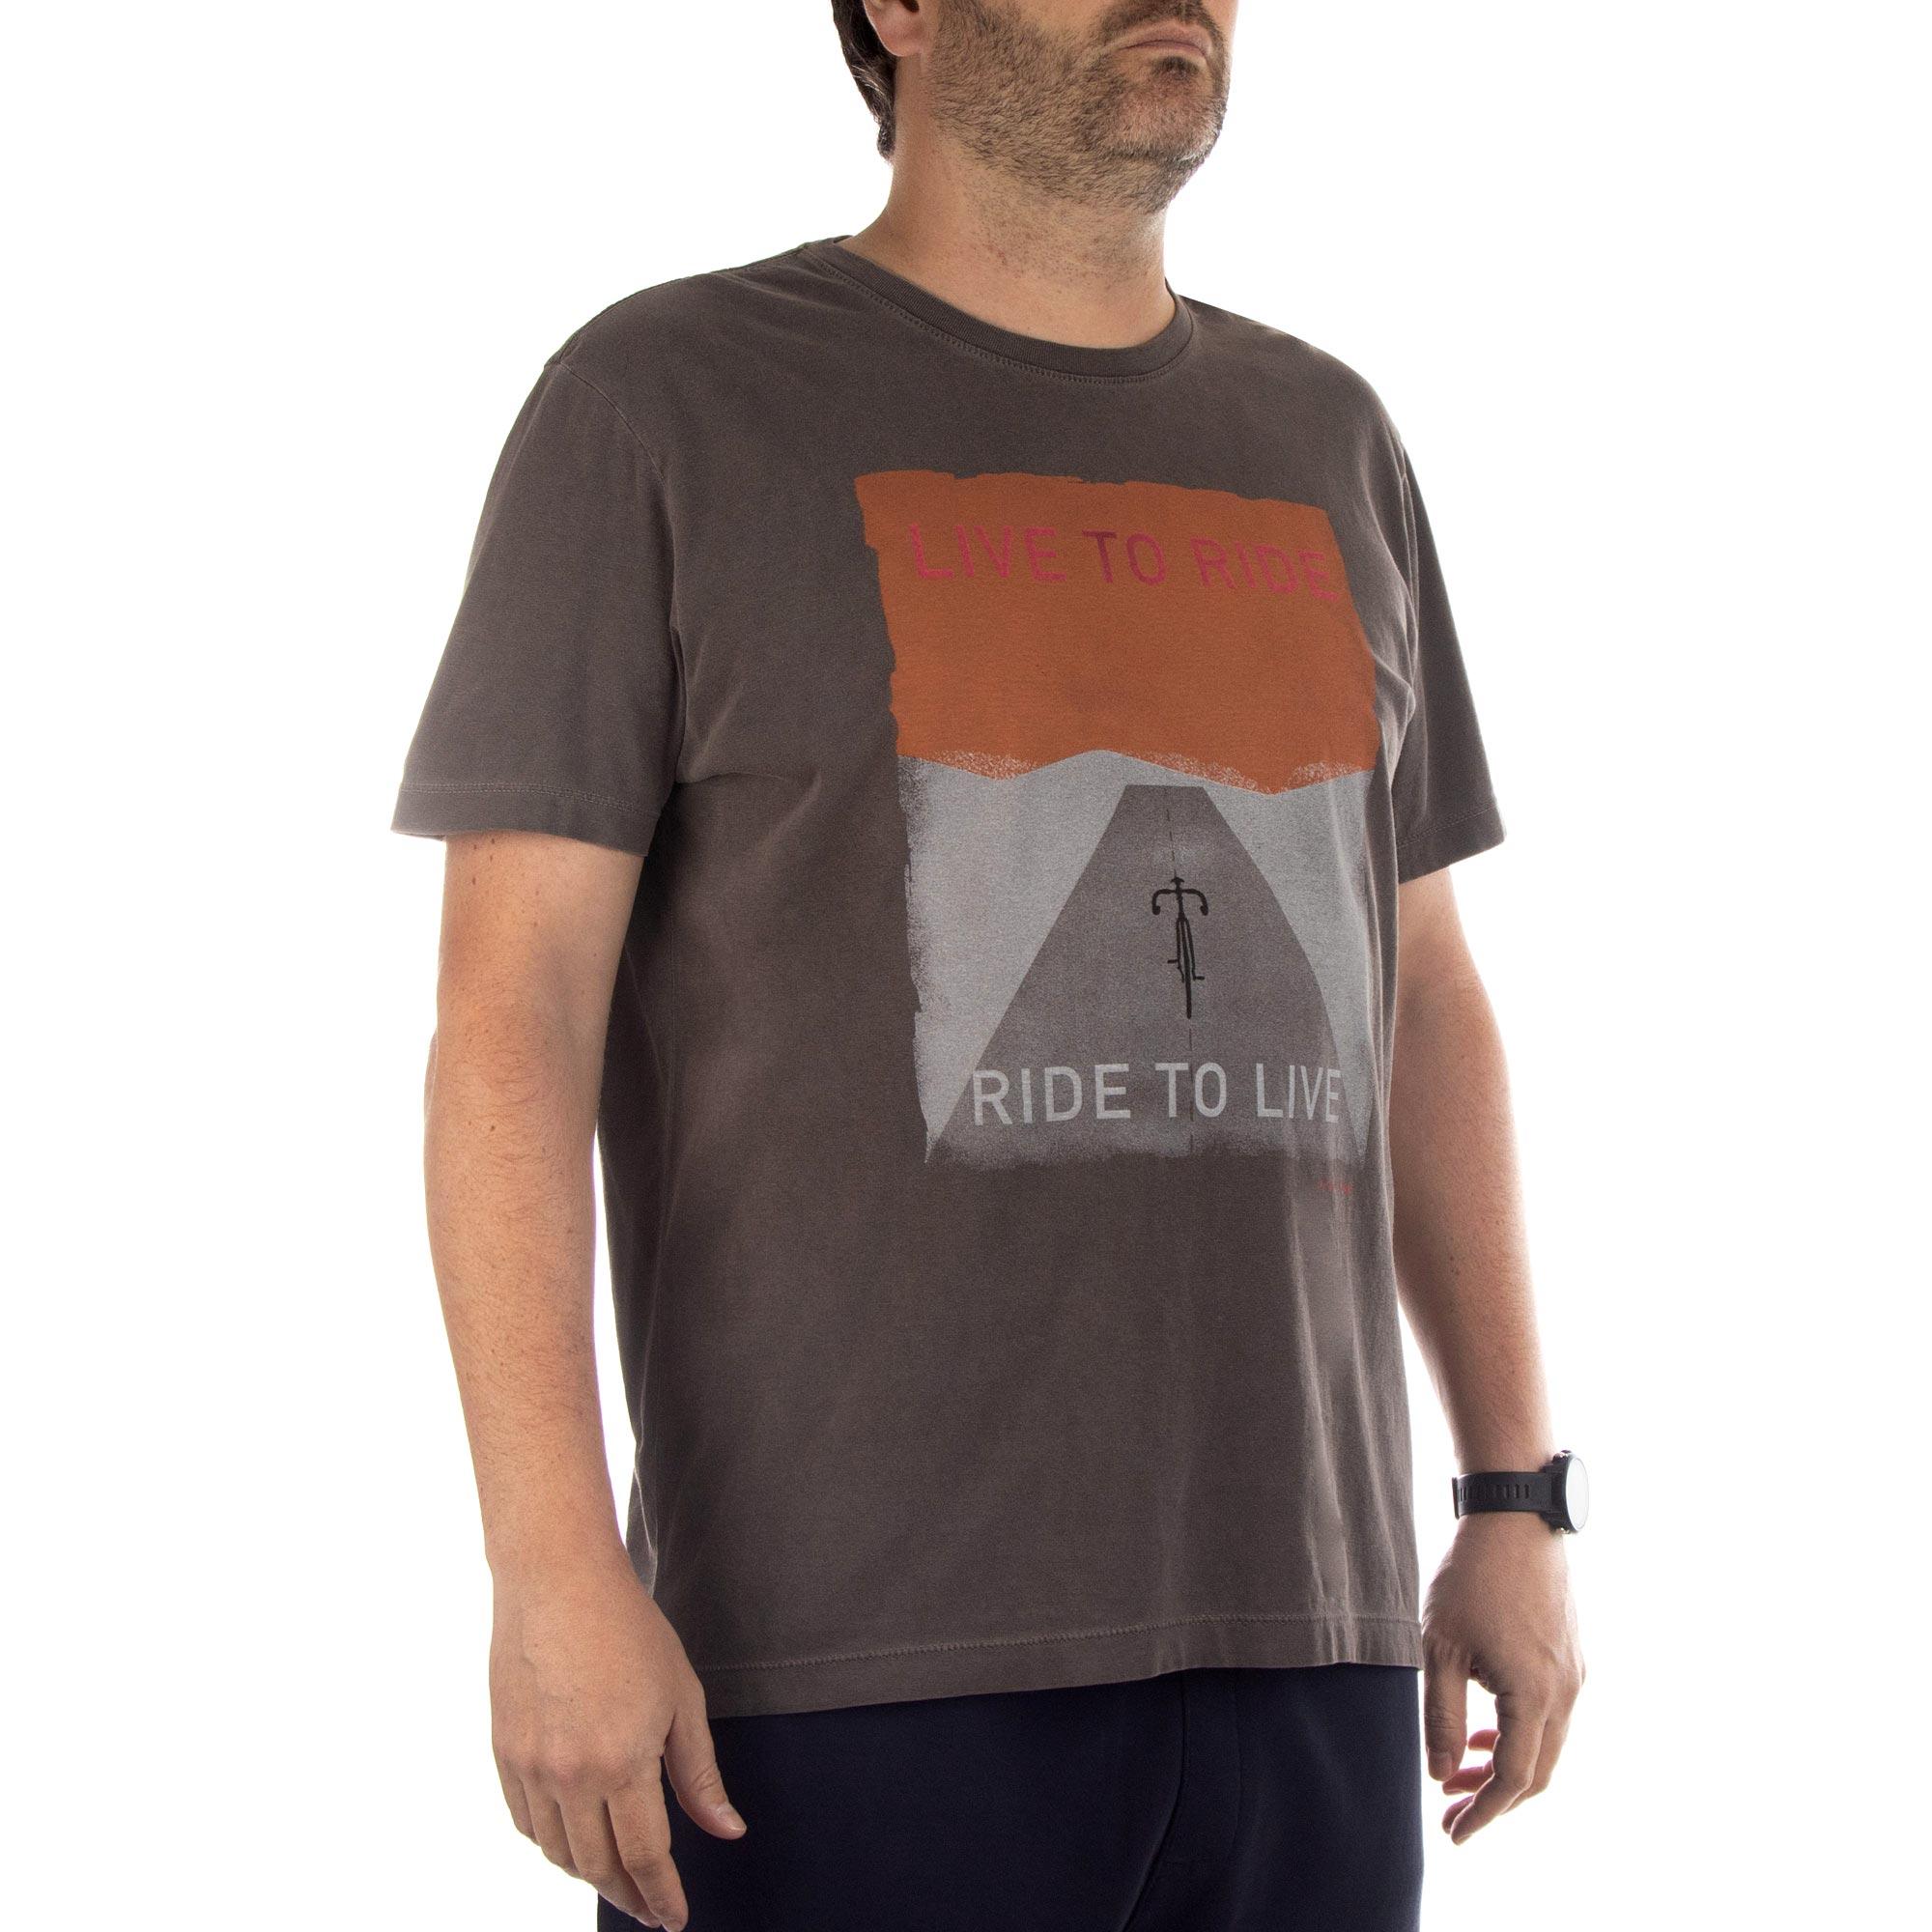 Richards Camiseta Malha Coraston Manga Curta Masculino Marrom